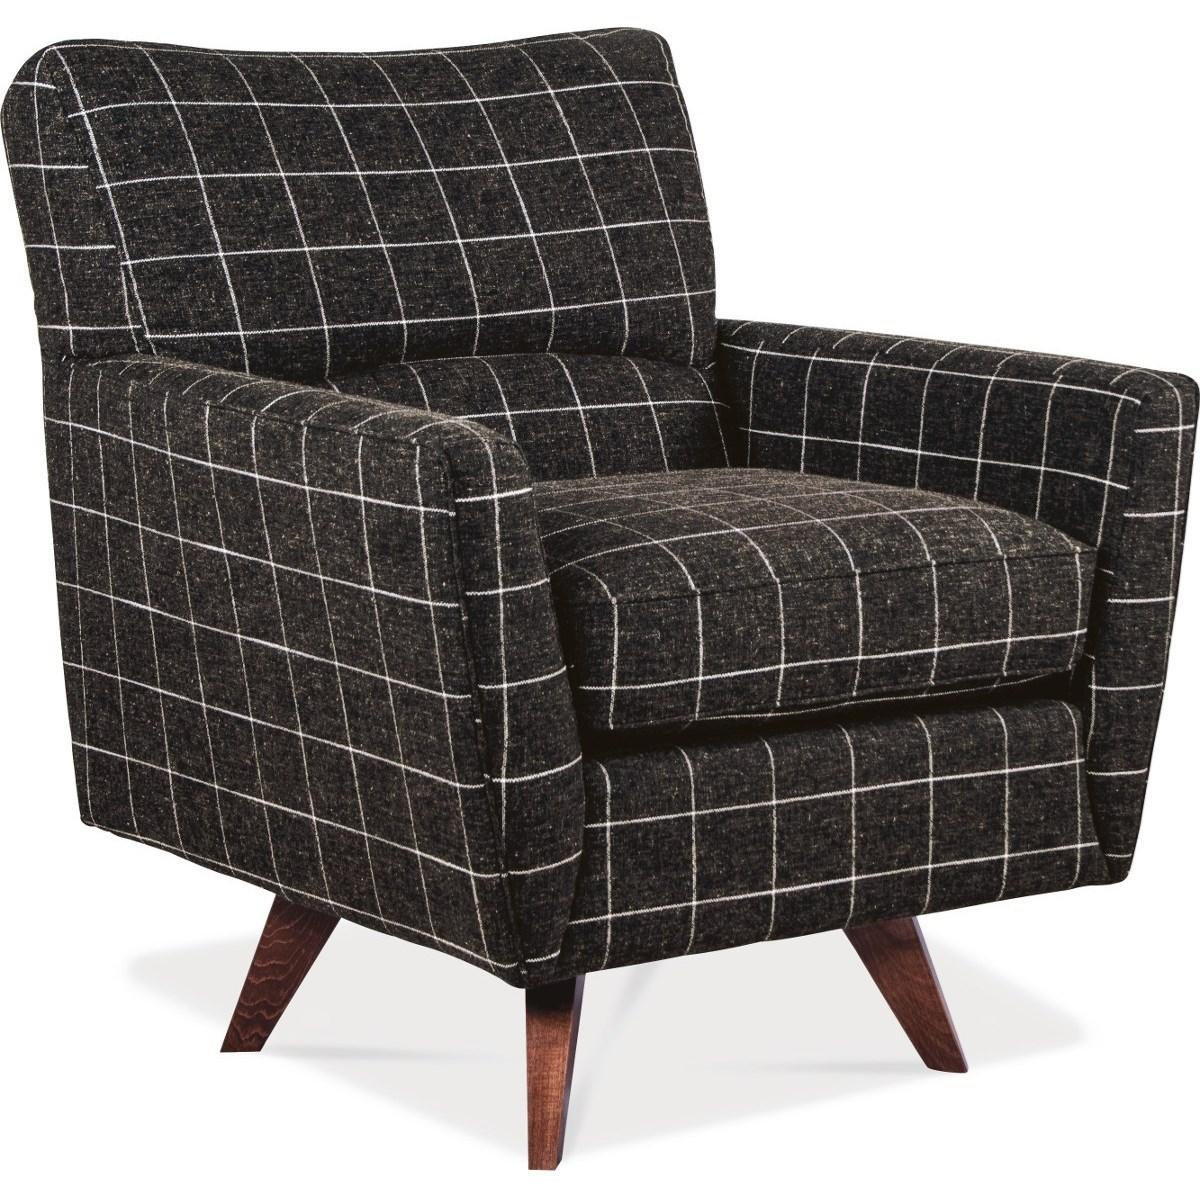 La Z Boy Chairs Bellevue Mid Century Modern High Leg Swivel Chair